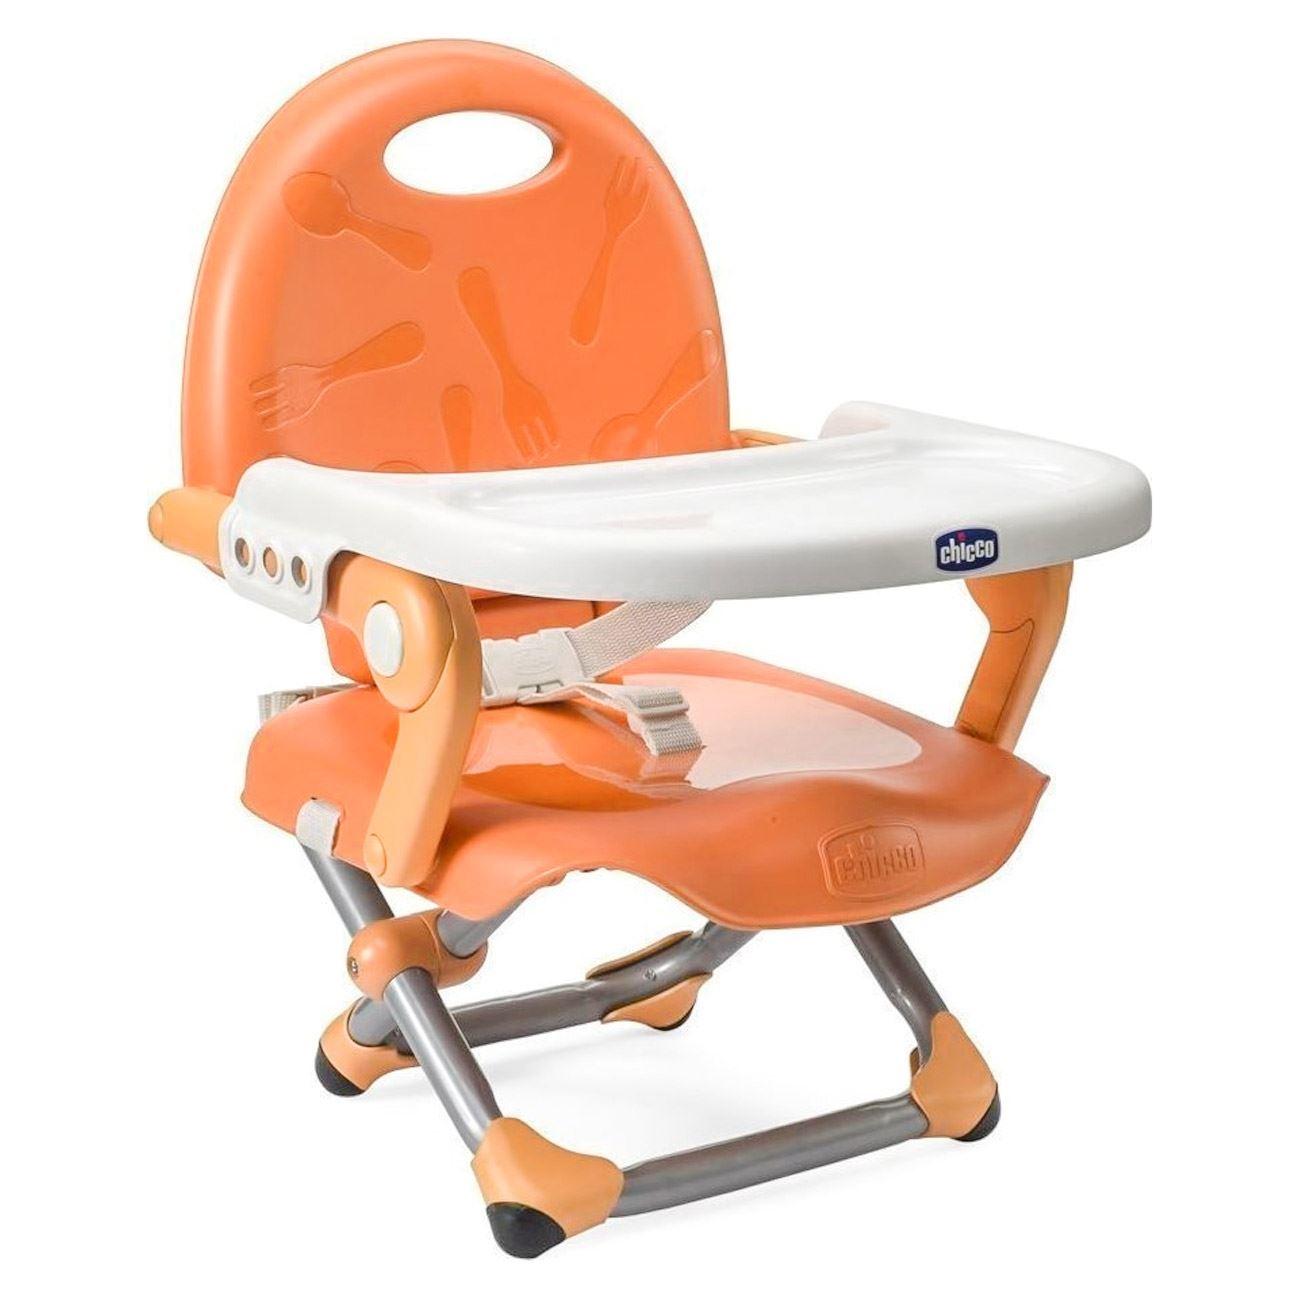 4434f51e78 Καρέκλα - Κάθισμα Φαγητού Pocket Snack - Chicco   Καρεκλάκια Booster ...